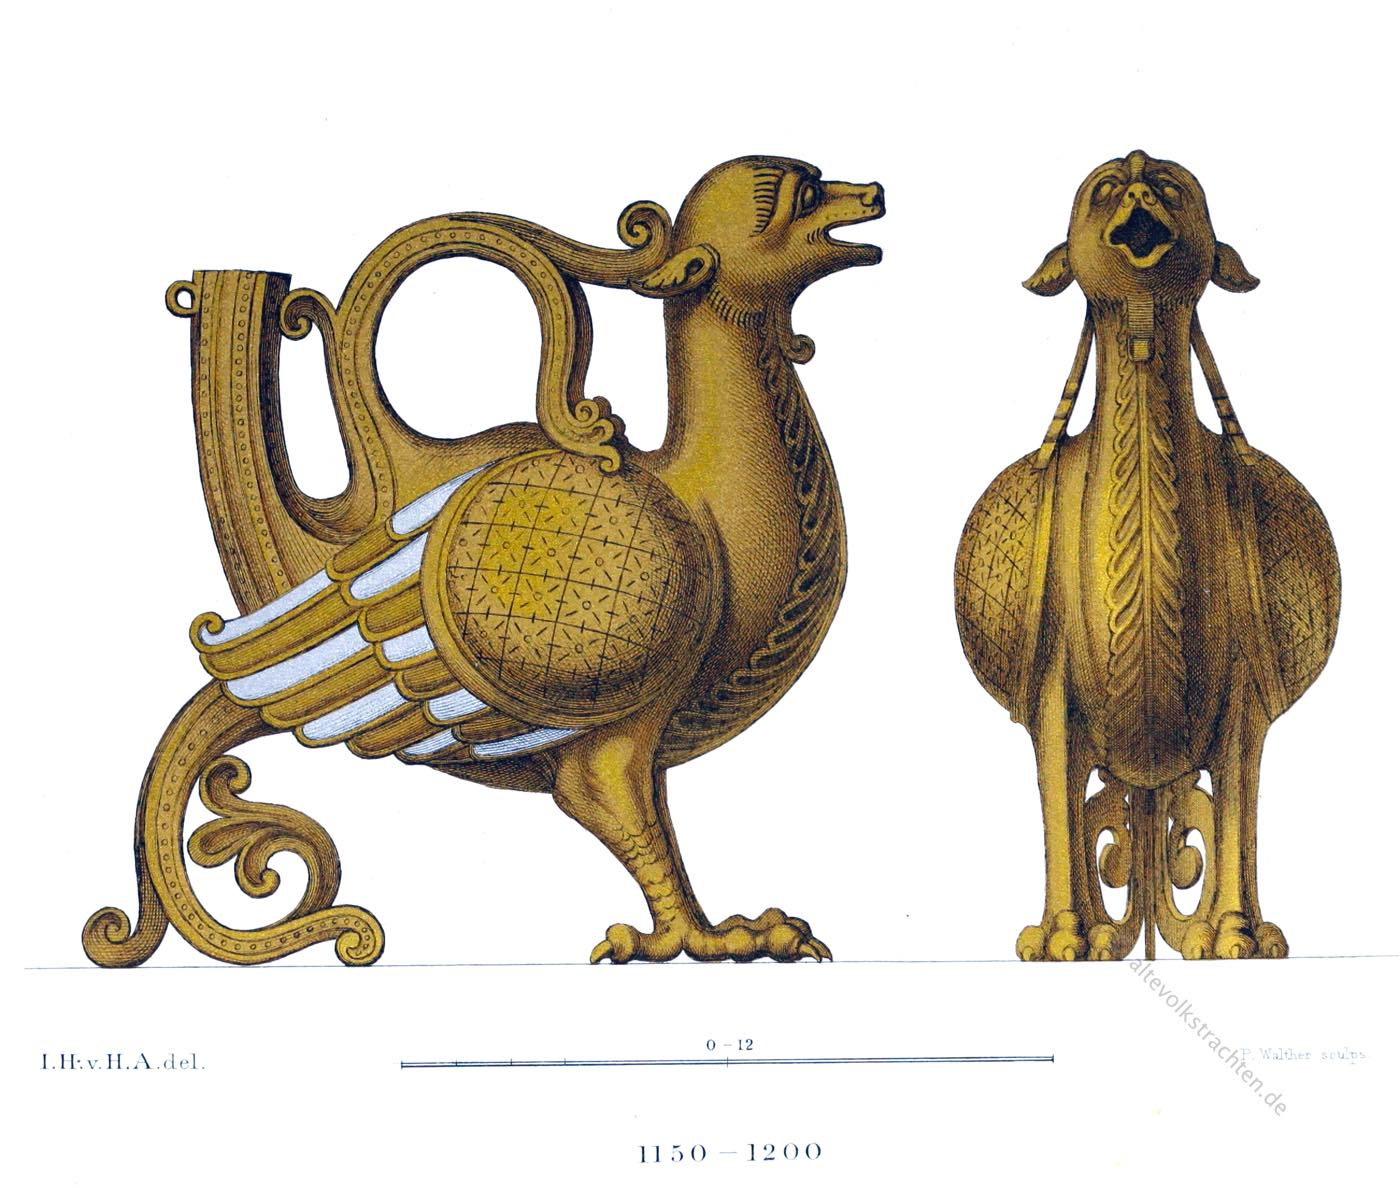 Aquamanile, Liturgie, fantastischen Tierfiguren, Romanik, Gegenstand, Mittelalter Gefäß,